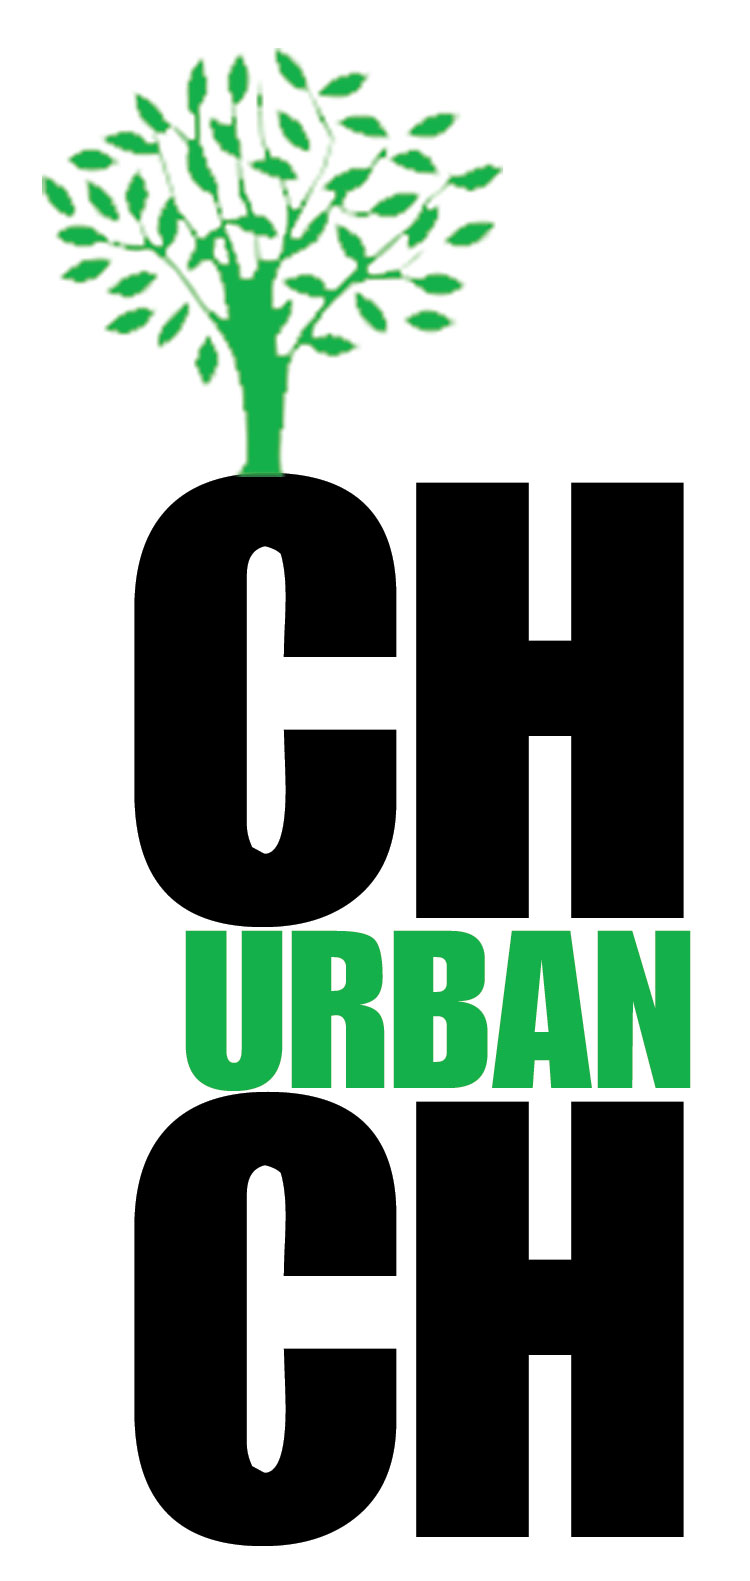 Capitol Hill Urban Cohousing logo